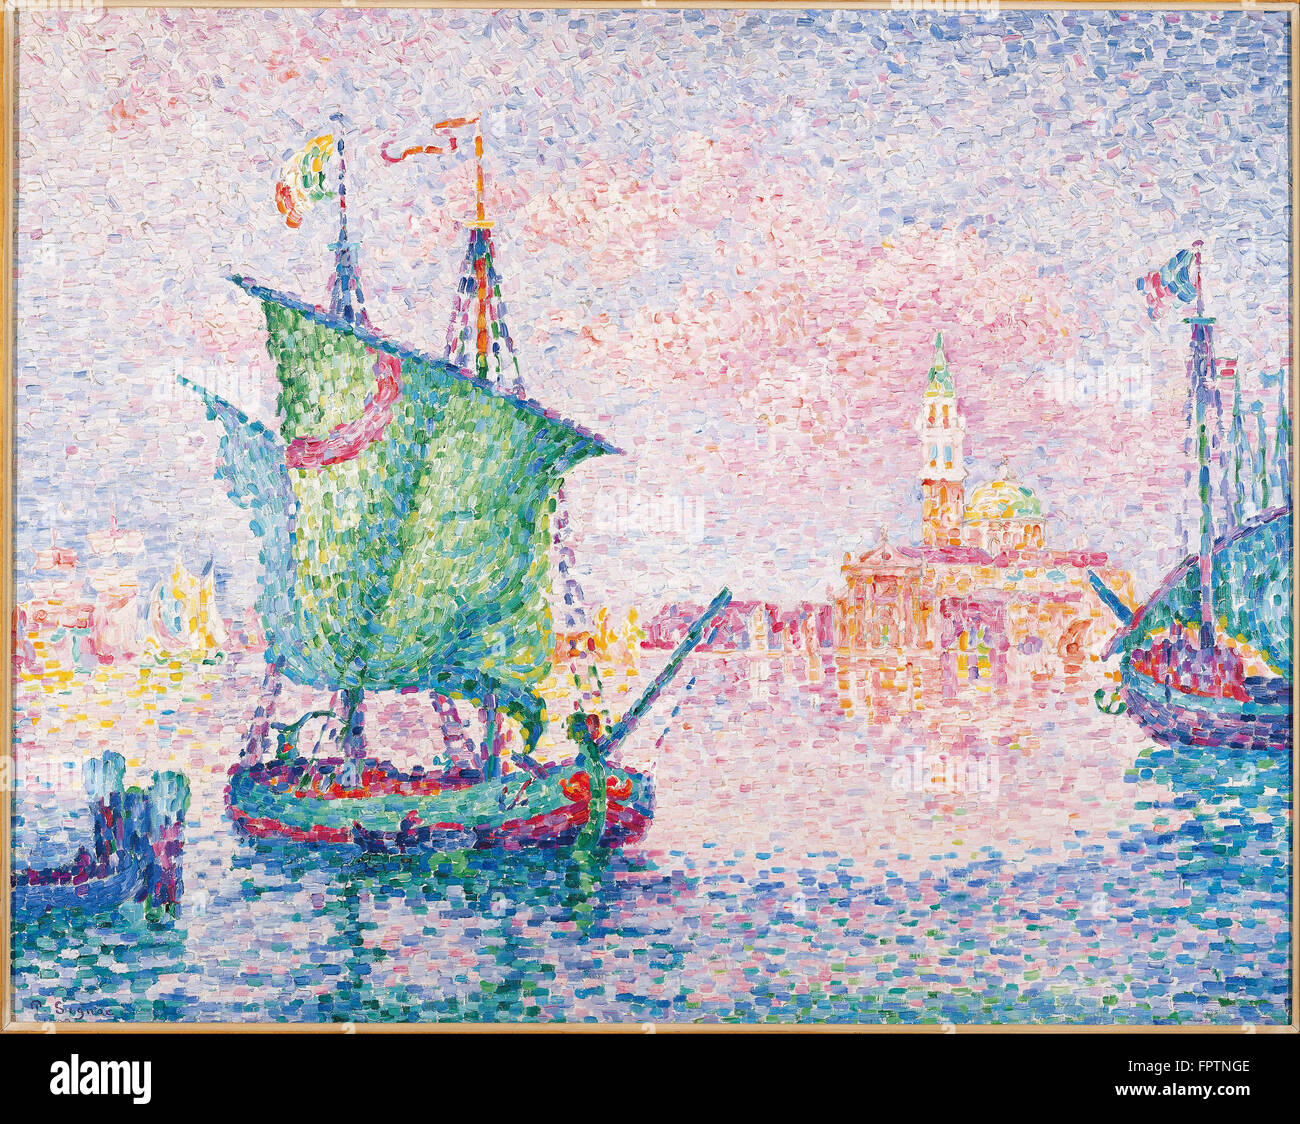 Paul Signac - Venice -  The Pink Cloud -  1909 - Stock Image